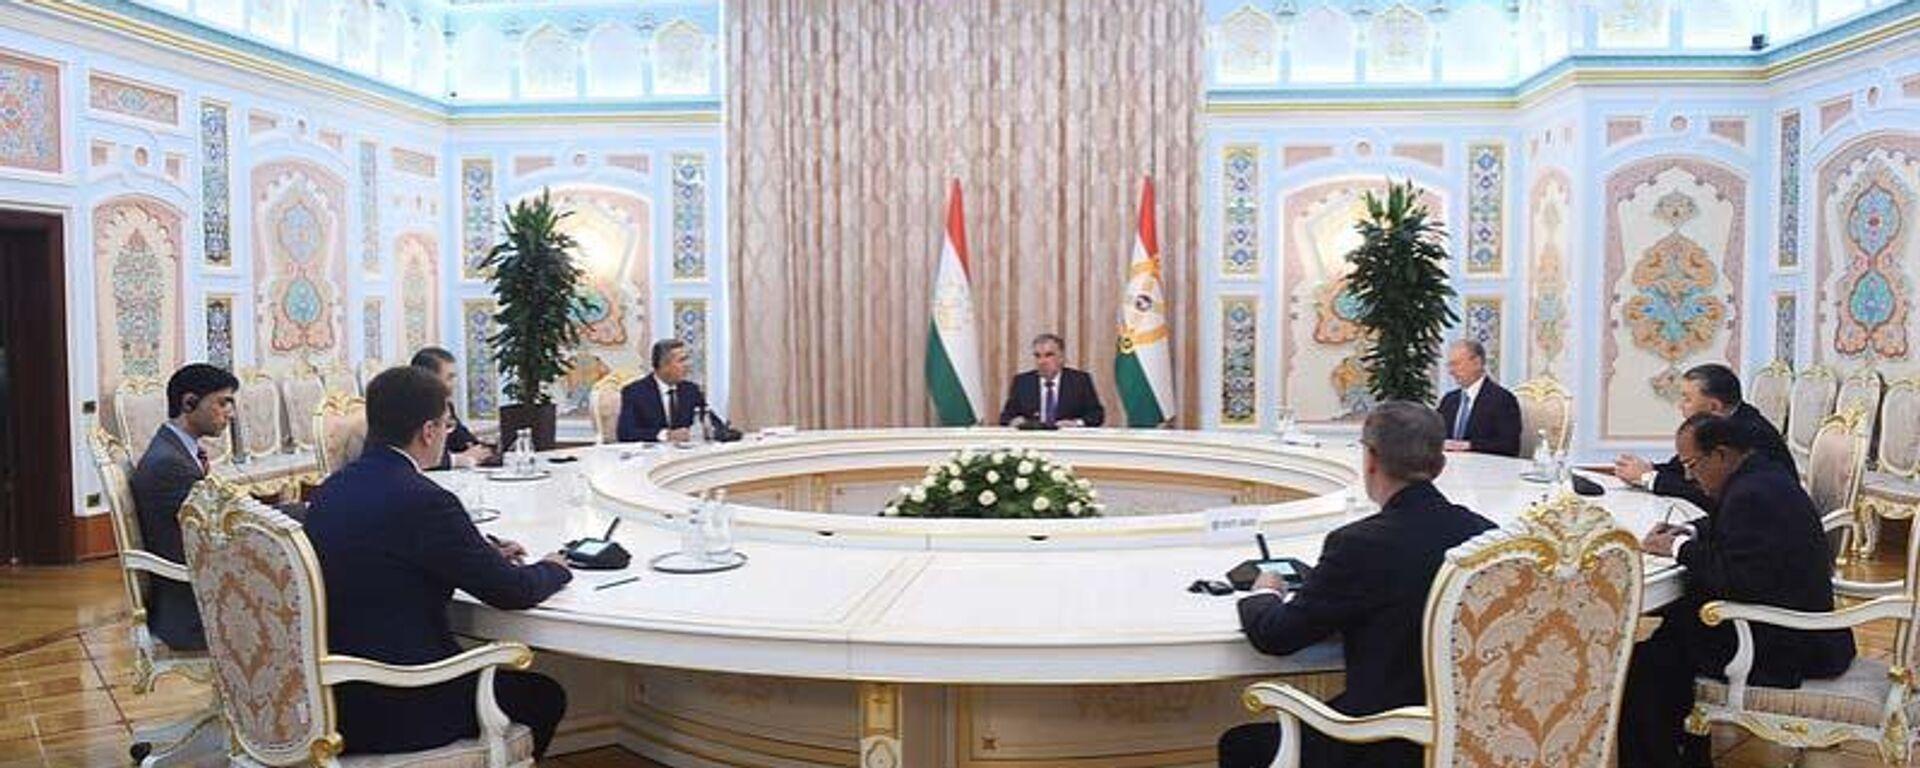 Президент Республики Таджикистан Эмомали Рахмон провел встречу с главами делегаций - Sputnik Таджикистан, 1920, 23.06.2021